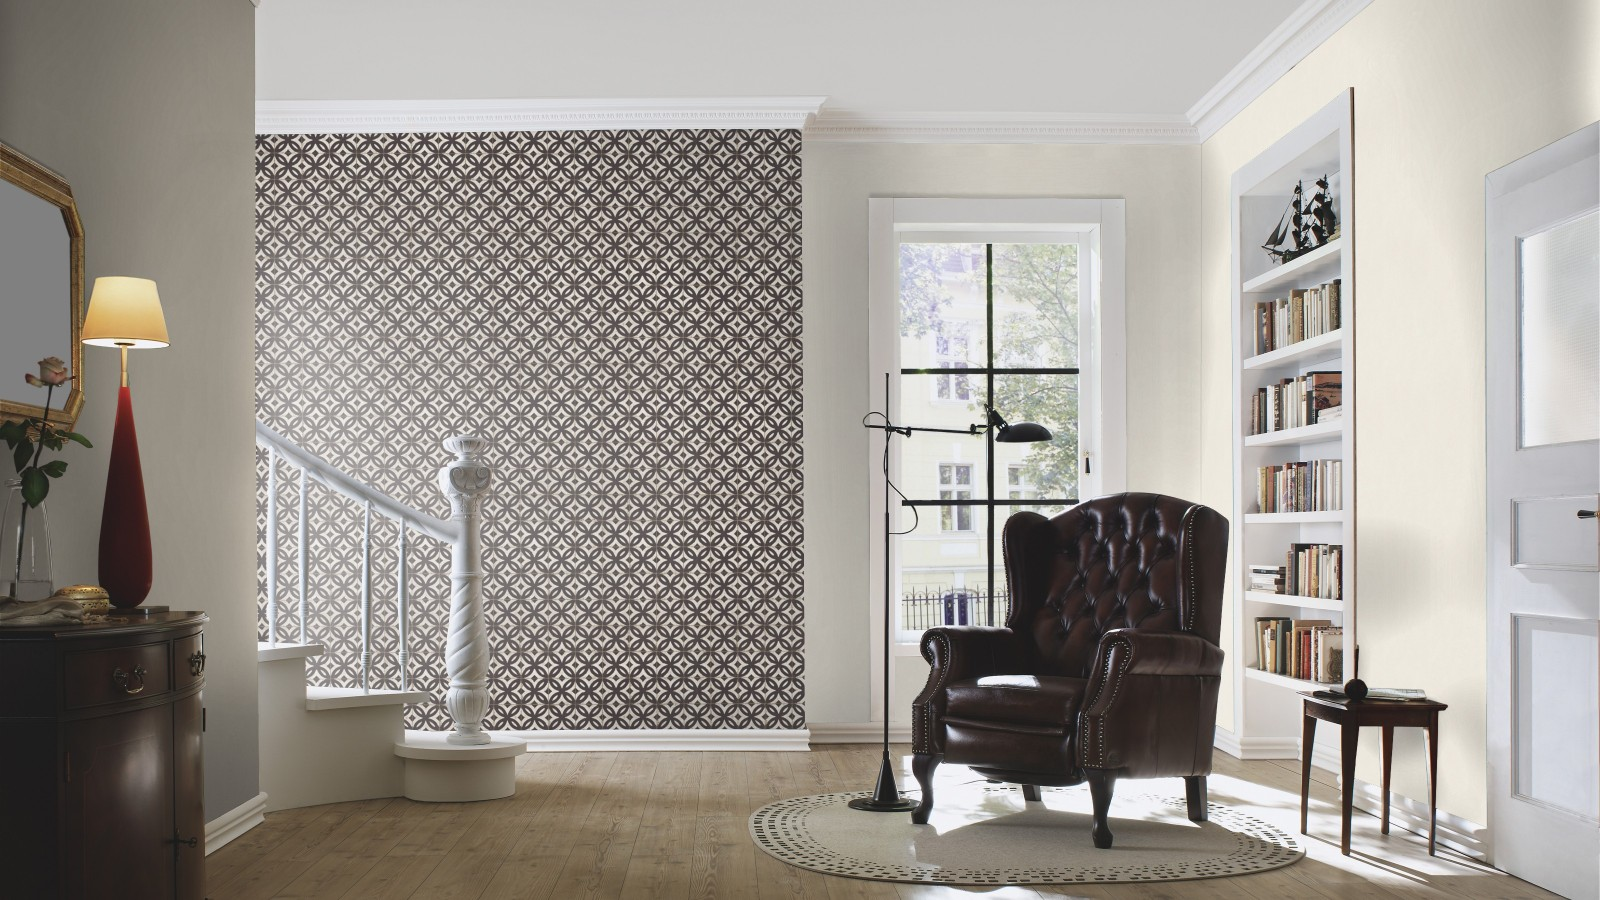 tapete rasch crispy paper fliesen grau braun 524710. Black Bedroom Furniture Sets. Home Design Ideas